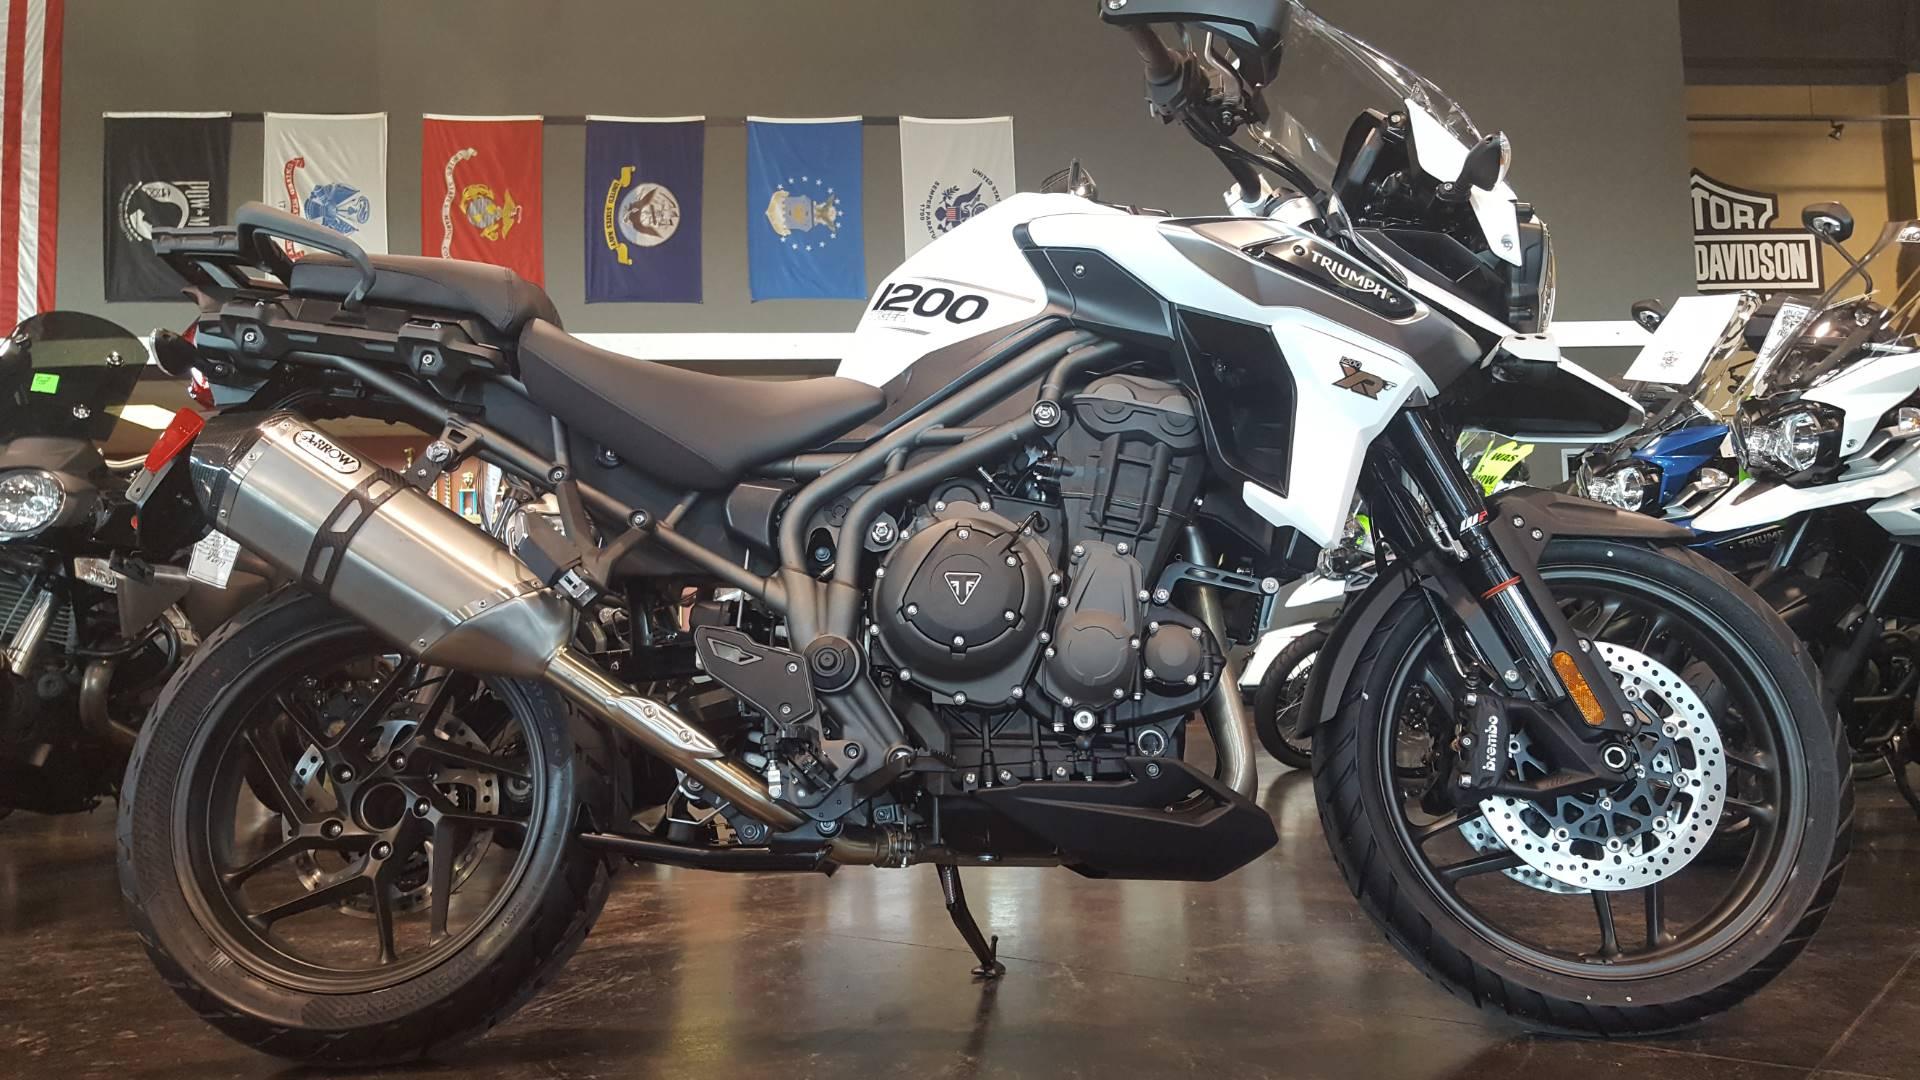 2018 triumph tiger 1200 xrt motorcycles saint charles illinois. Black Bedroom Furniture Sets. Home Design Ideas